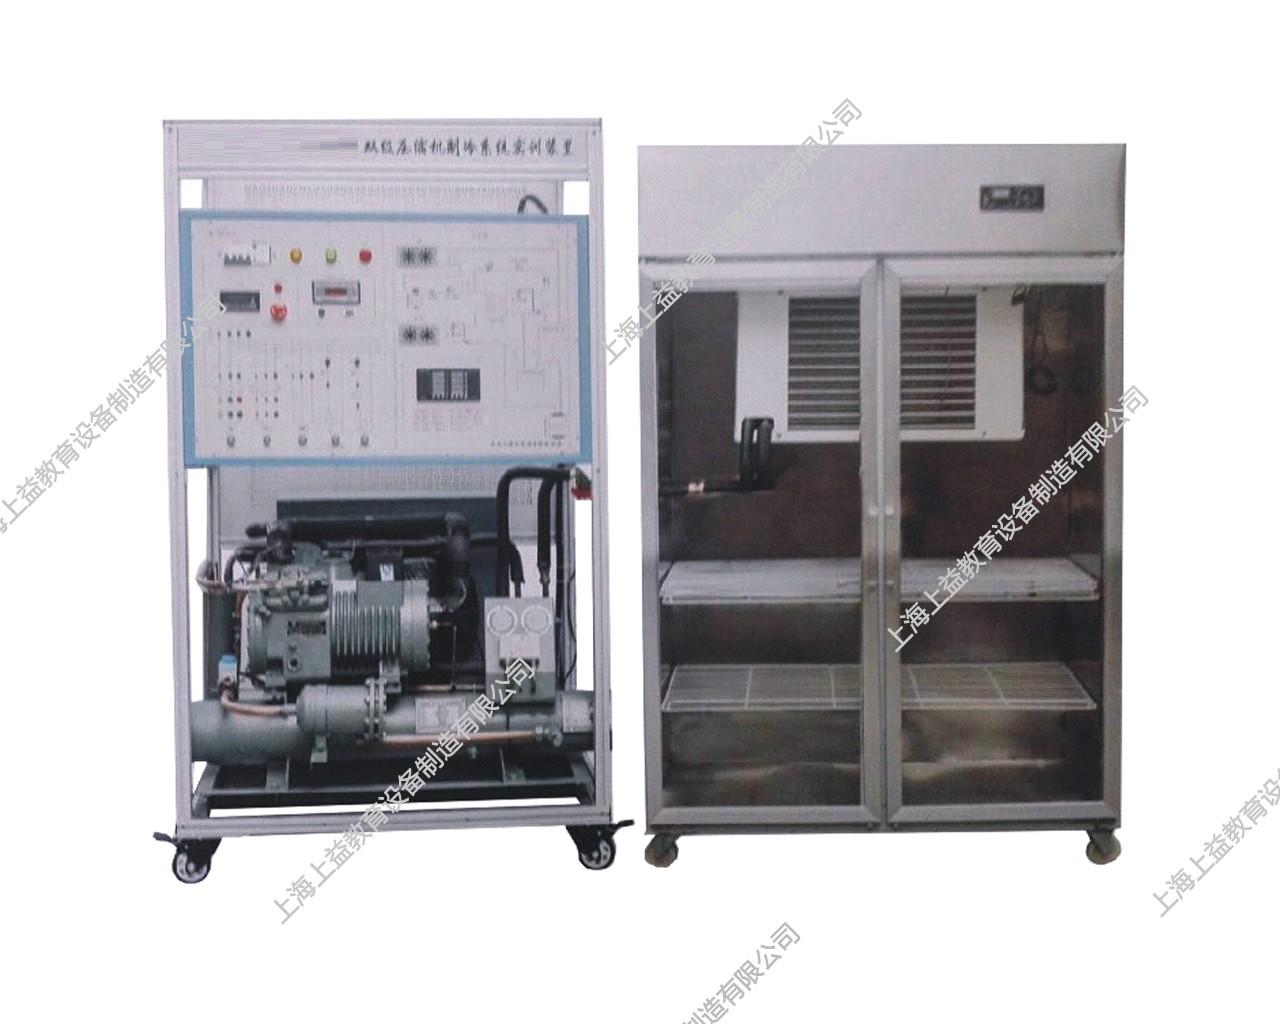 SY-JDY-56型低温冷冻库系统综合wwwlehu8vip装置